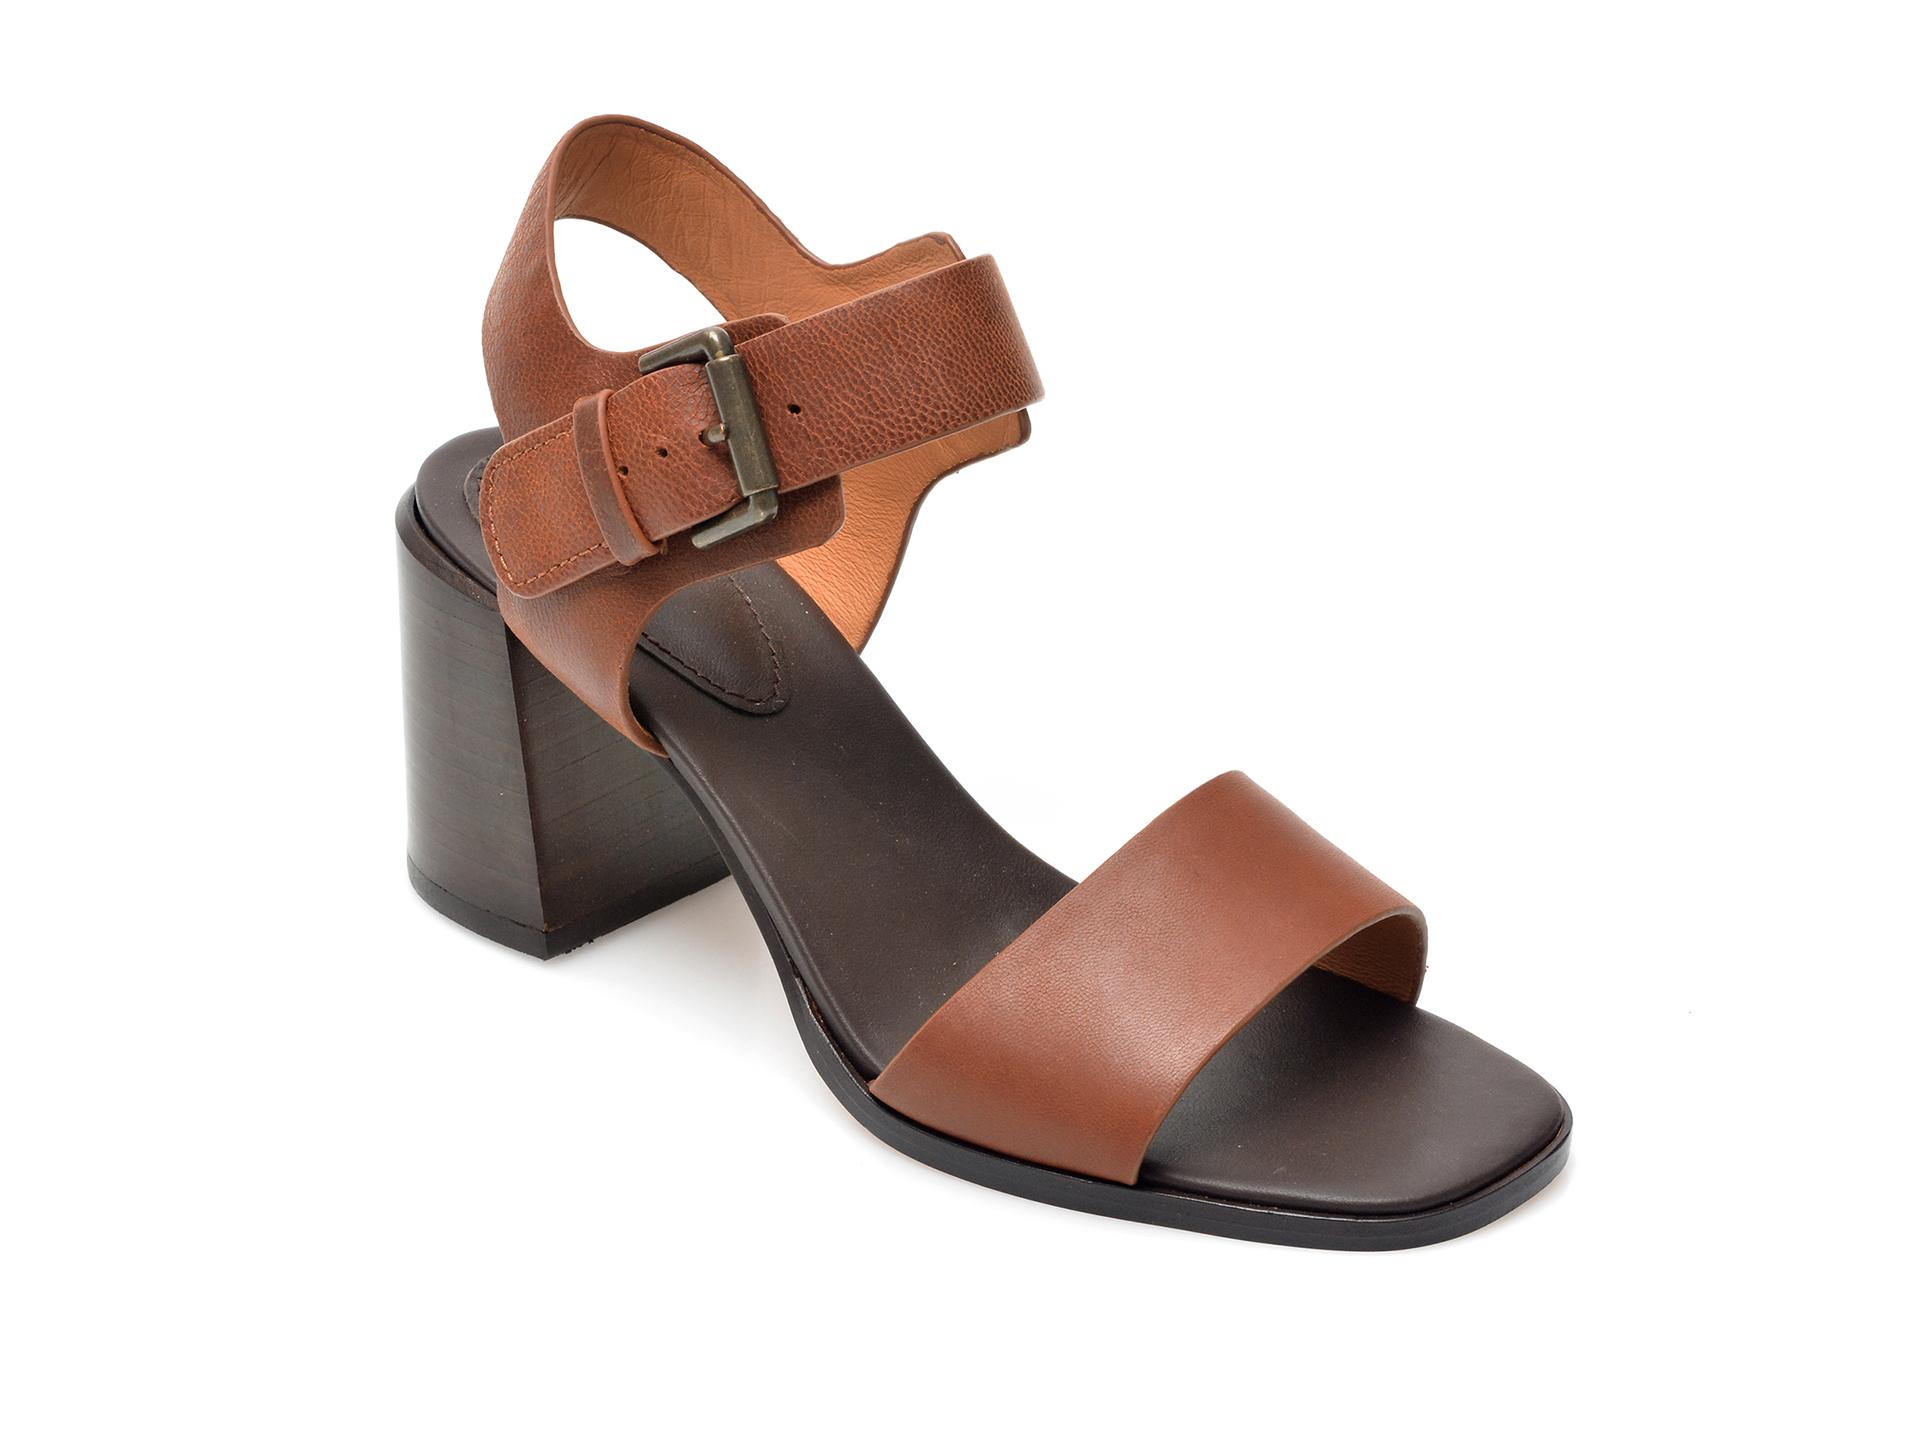 Sandale CLARKS maro, Landra70 Strap, din piele naturala imagine otter.ro 2021